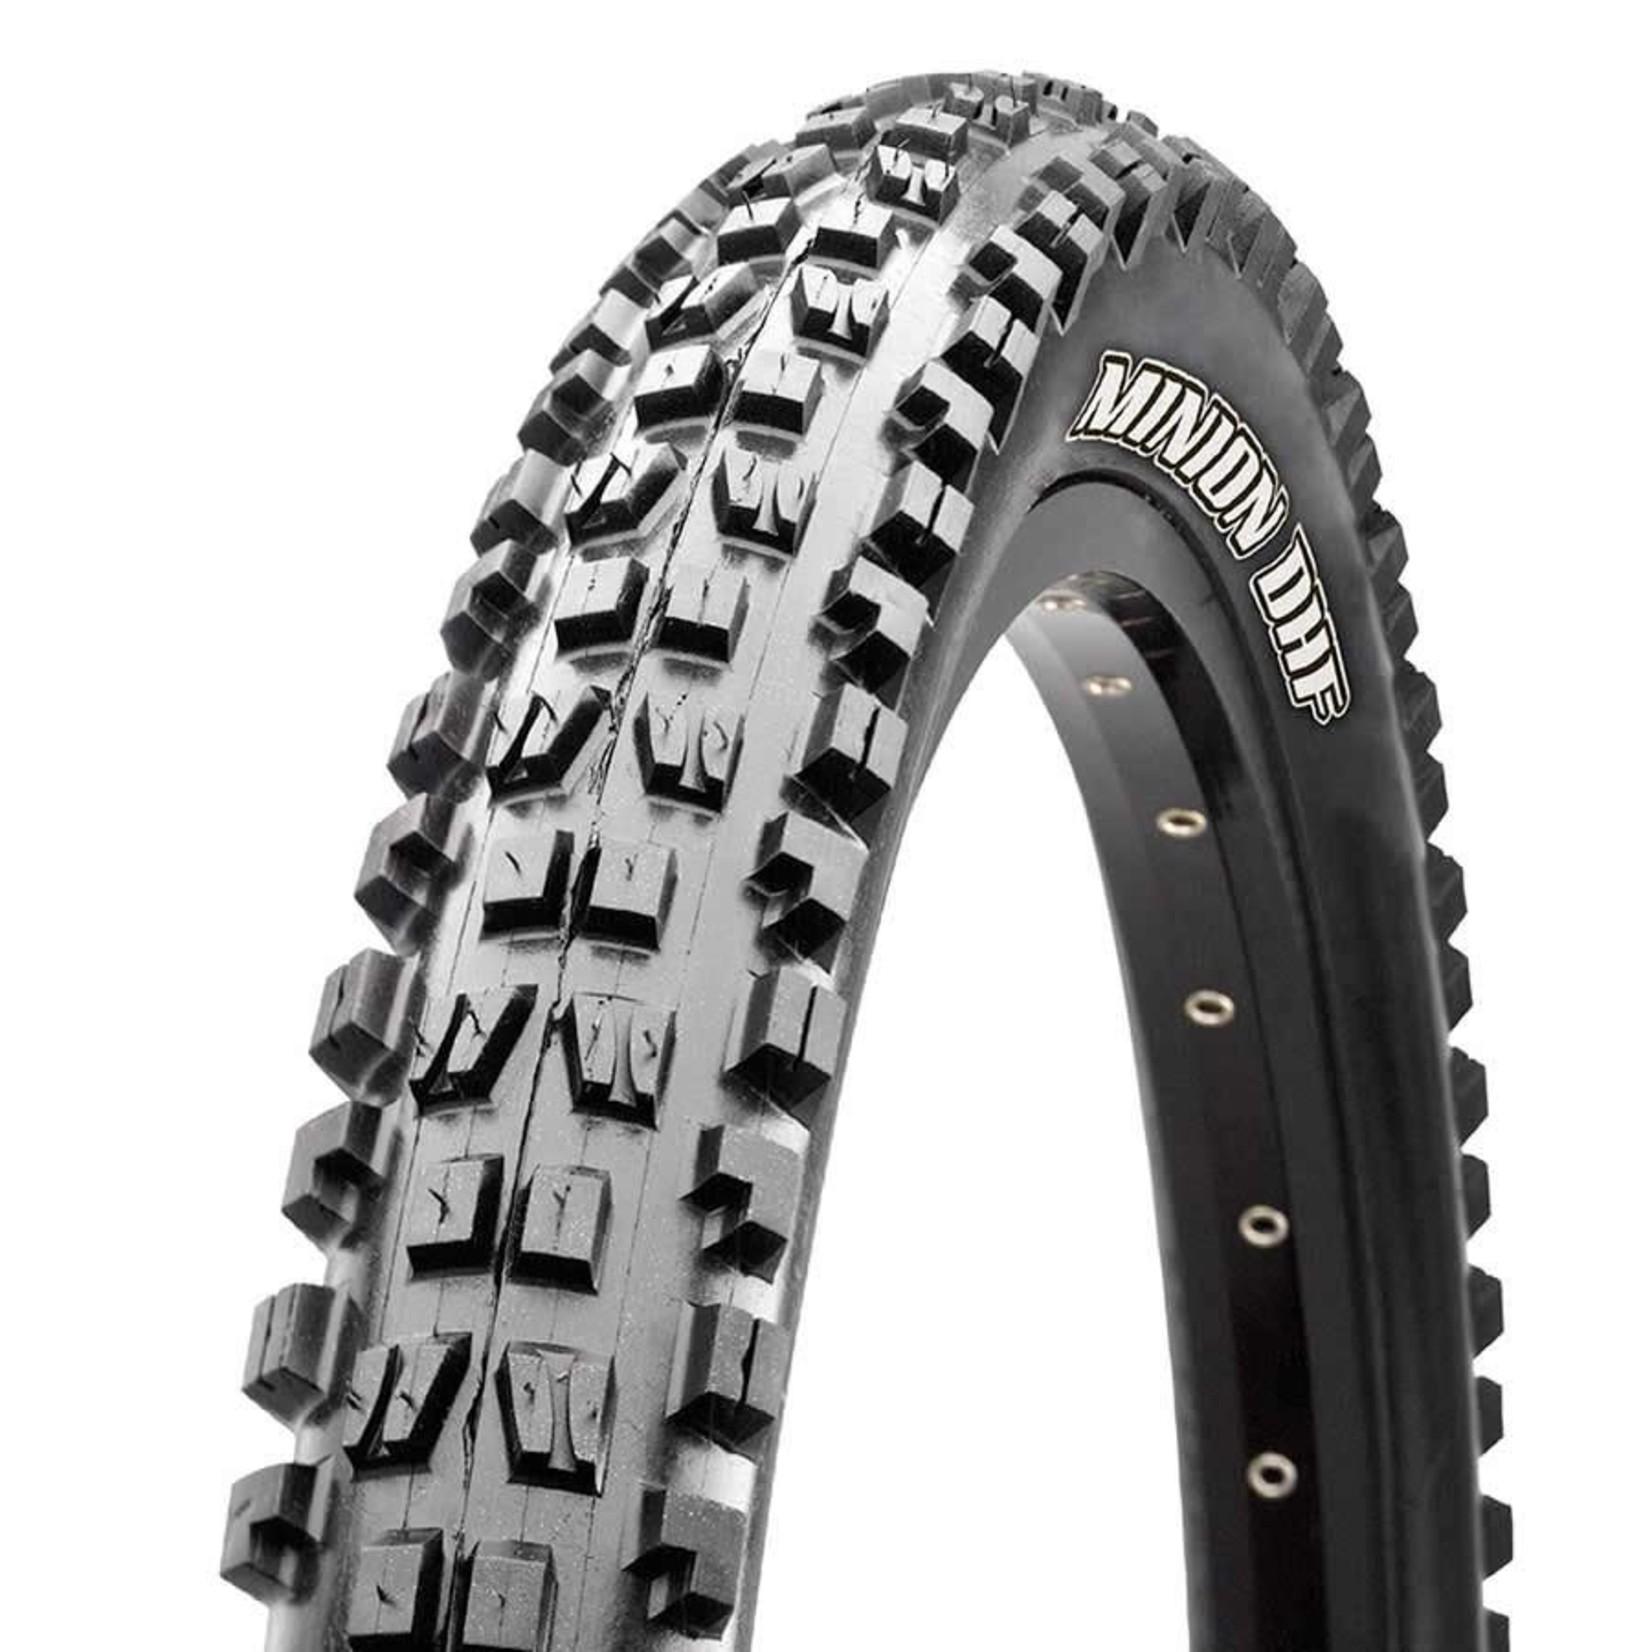 Maxxis Minion DHF, Tire, 29''x2.60, Folding, Tubeless Ready, 3C Maxx Terra, EXO, Wide Trail, 120TPi, Black